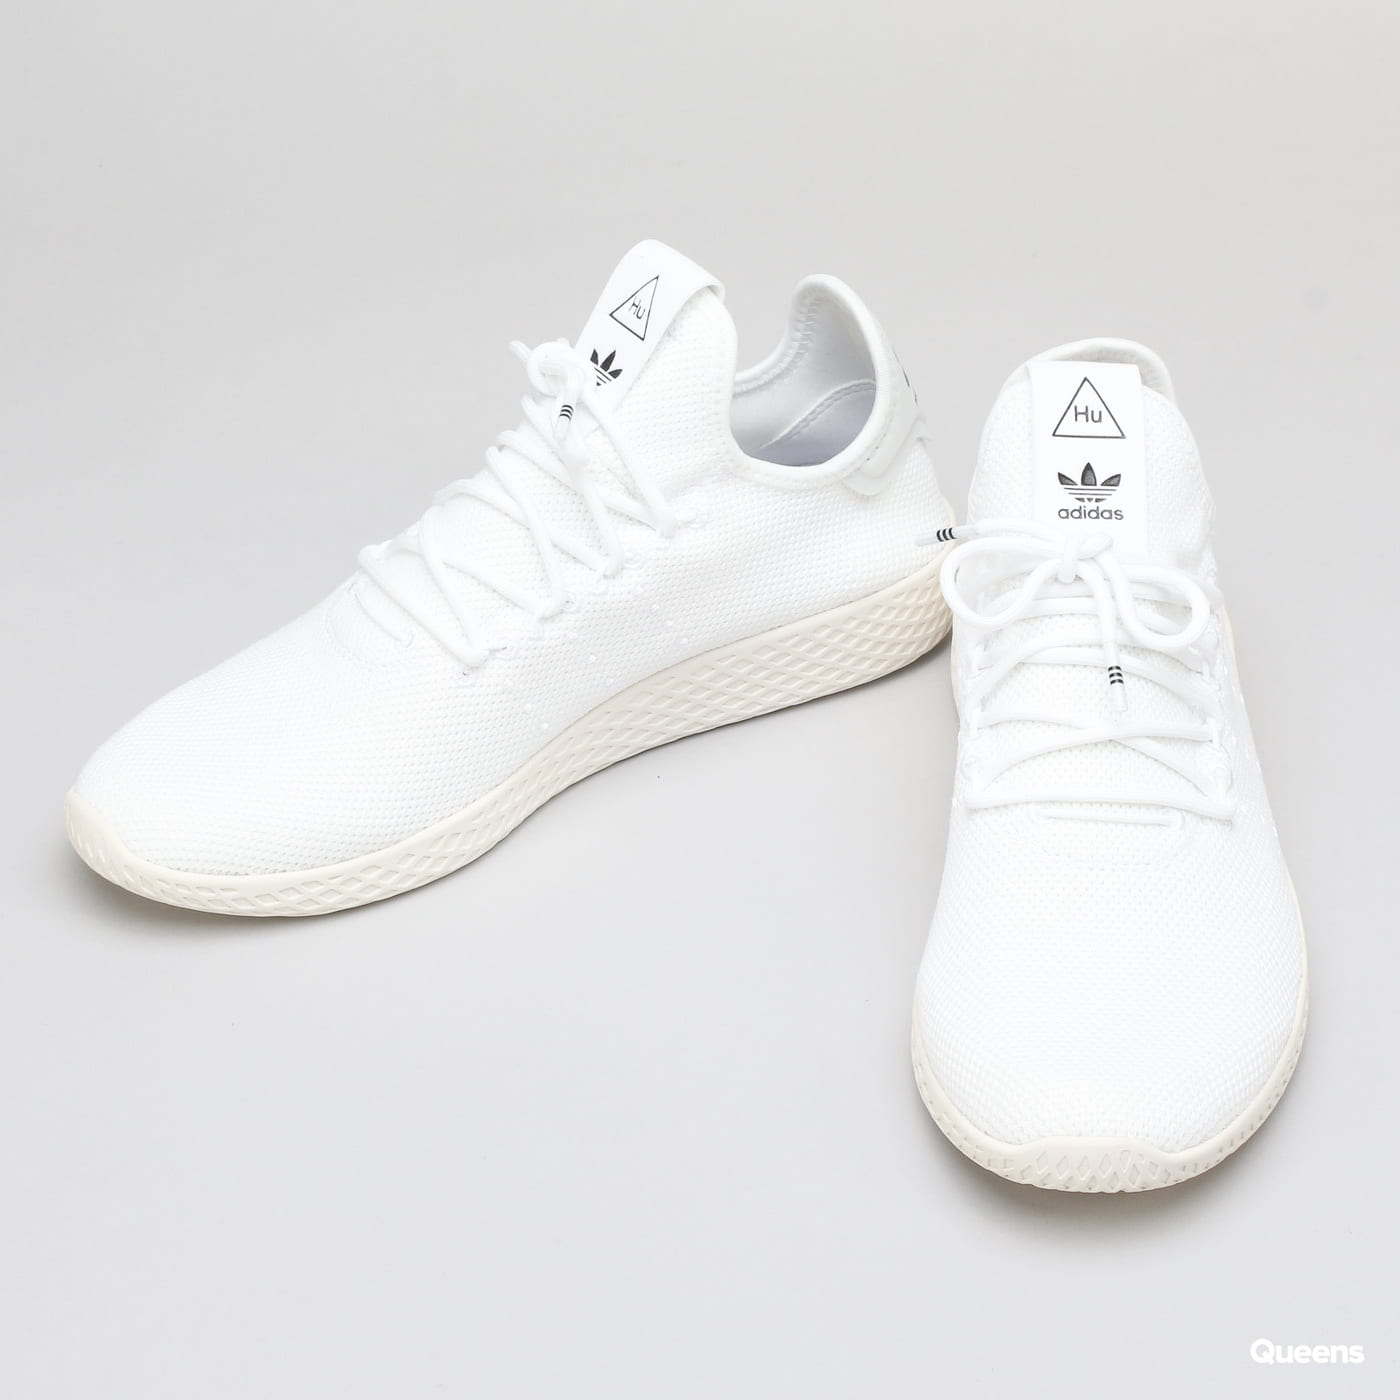 adidas Originals Pharrell Williams Tennis HU ftwwht / ftwwht / cwhite